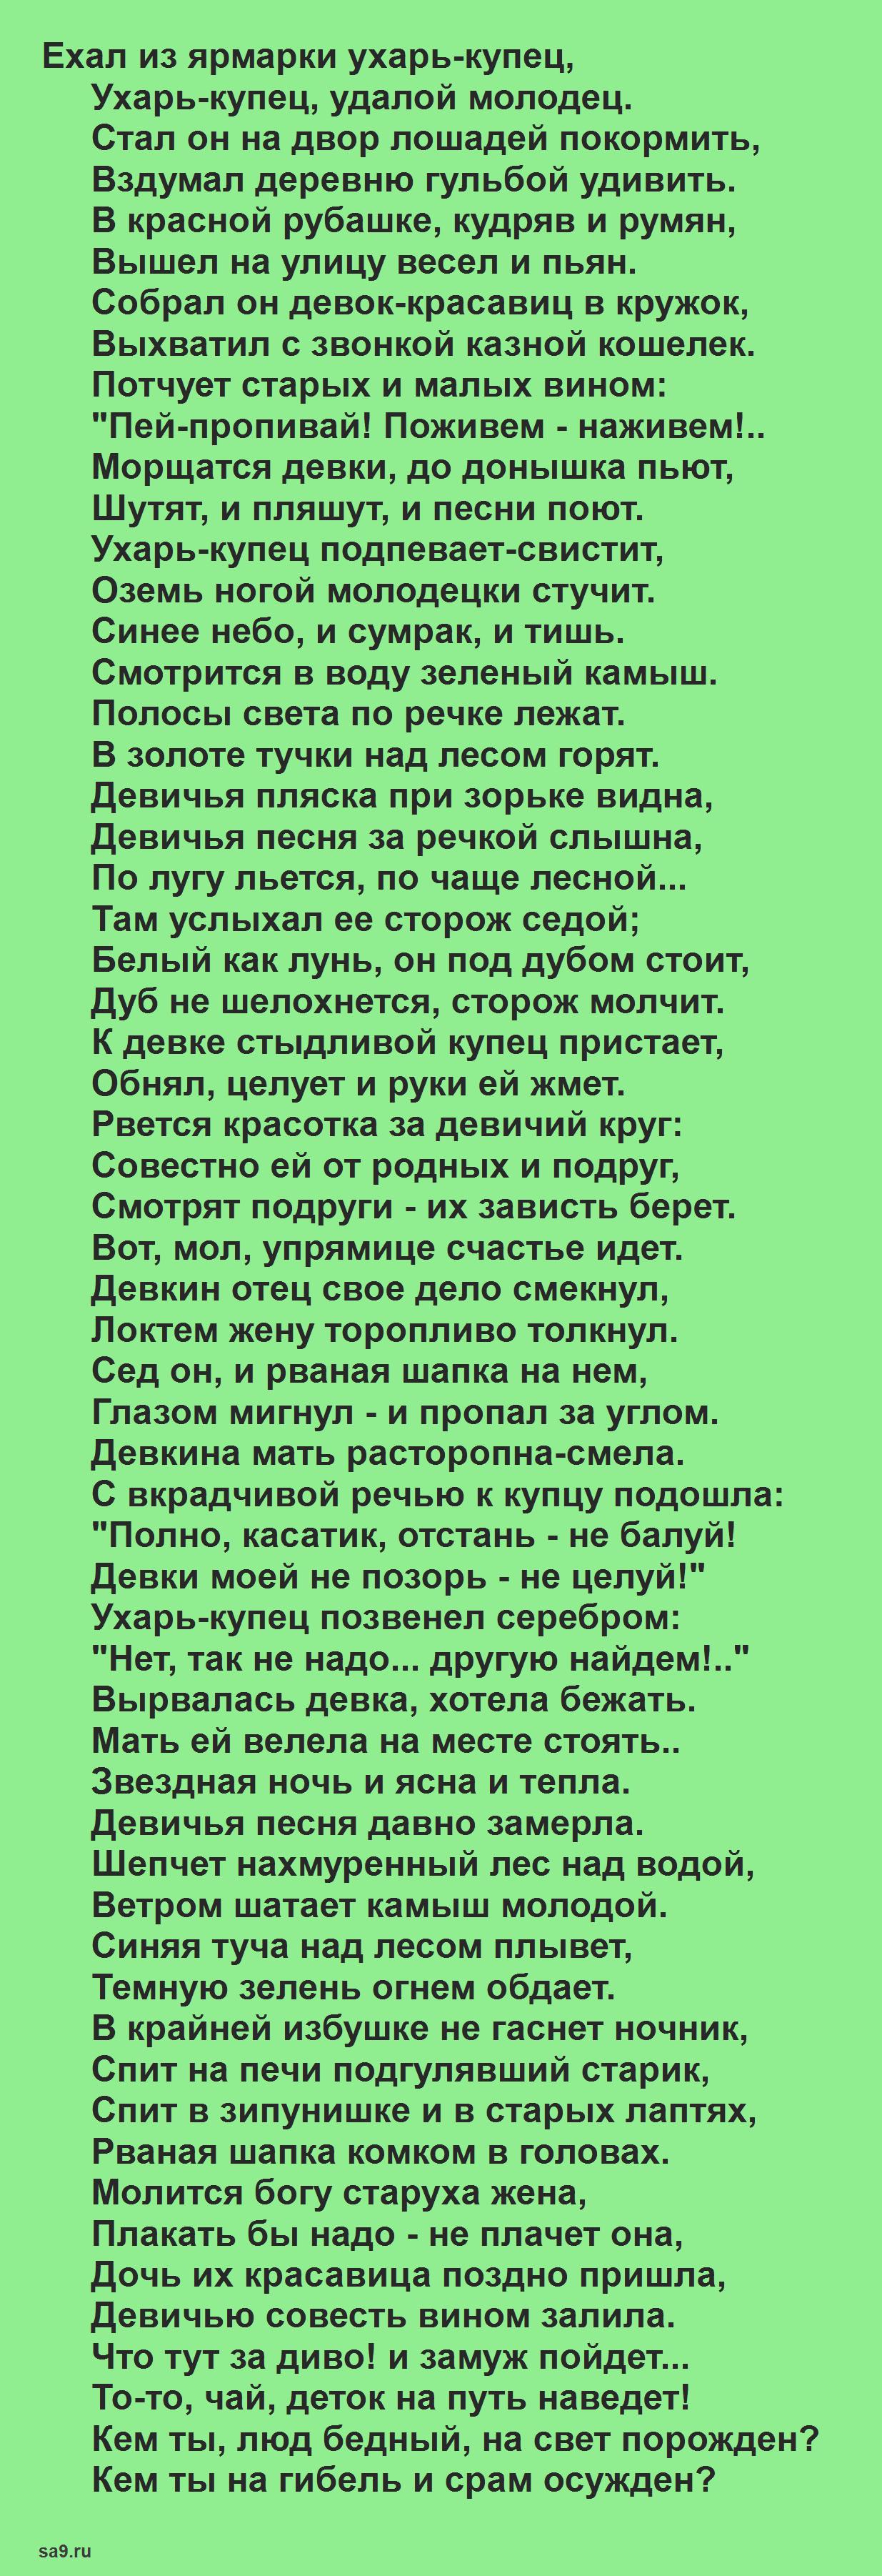 Песни на стихи Никитина - С ярмарки ехал ухарь купец